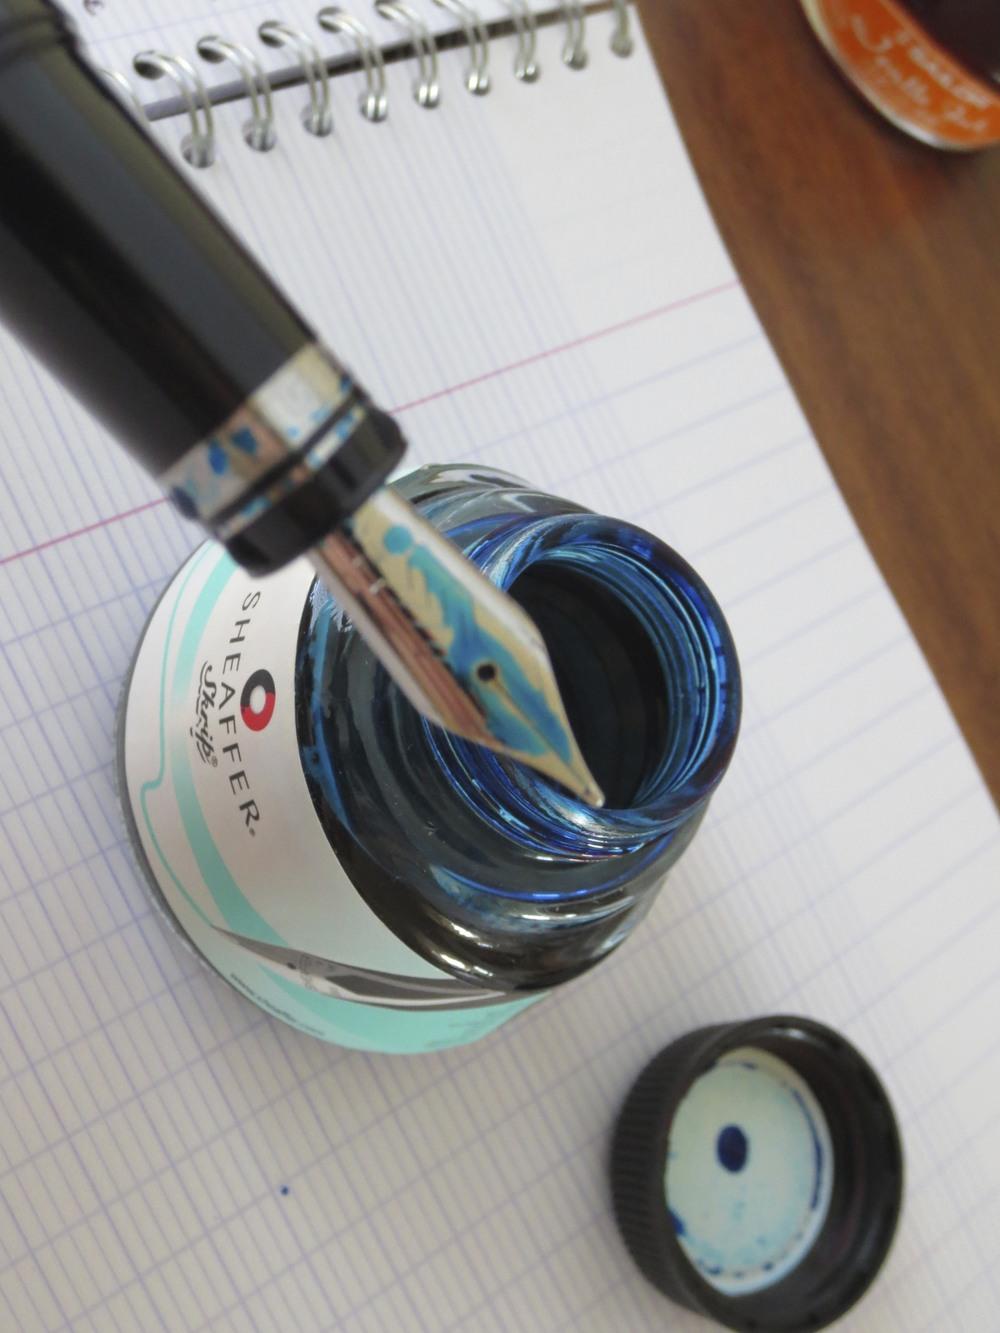 Omas 360 Nib and Turquoise